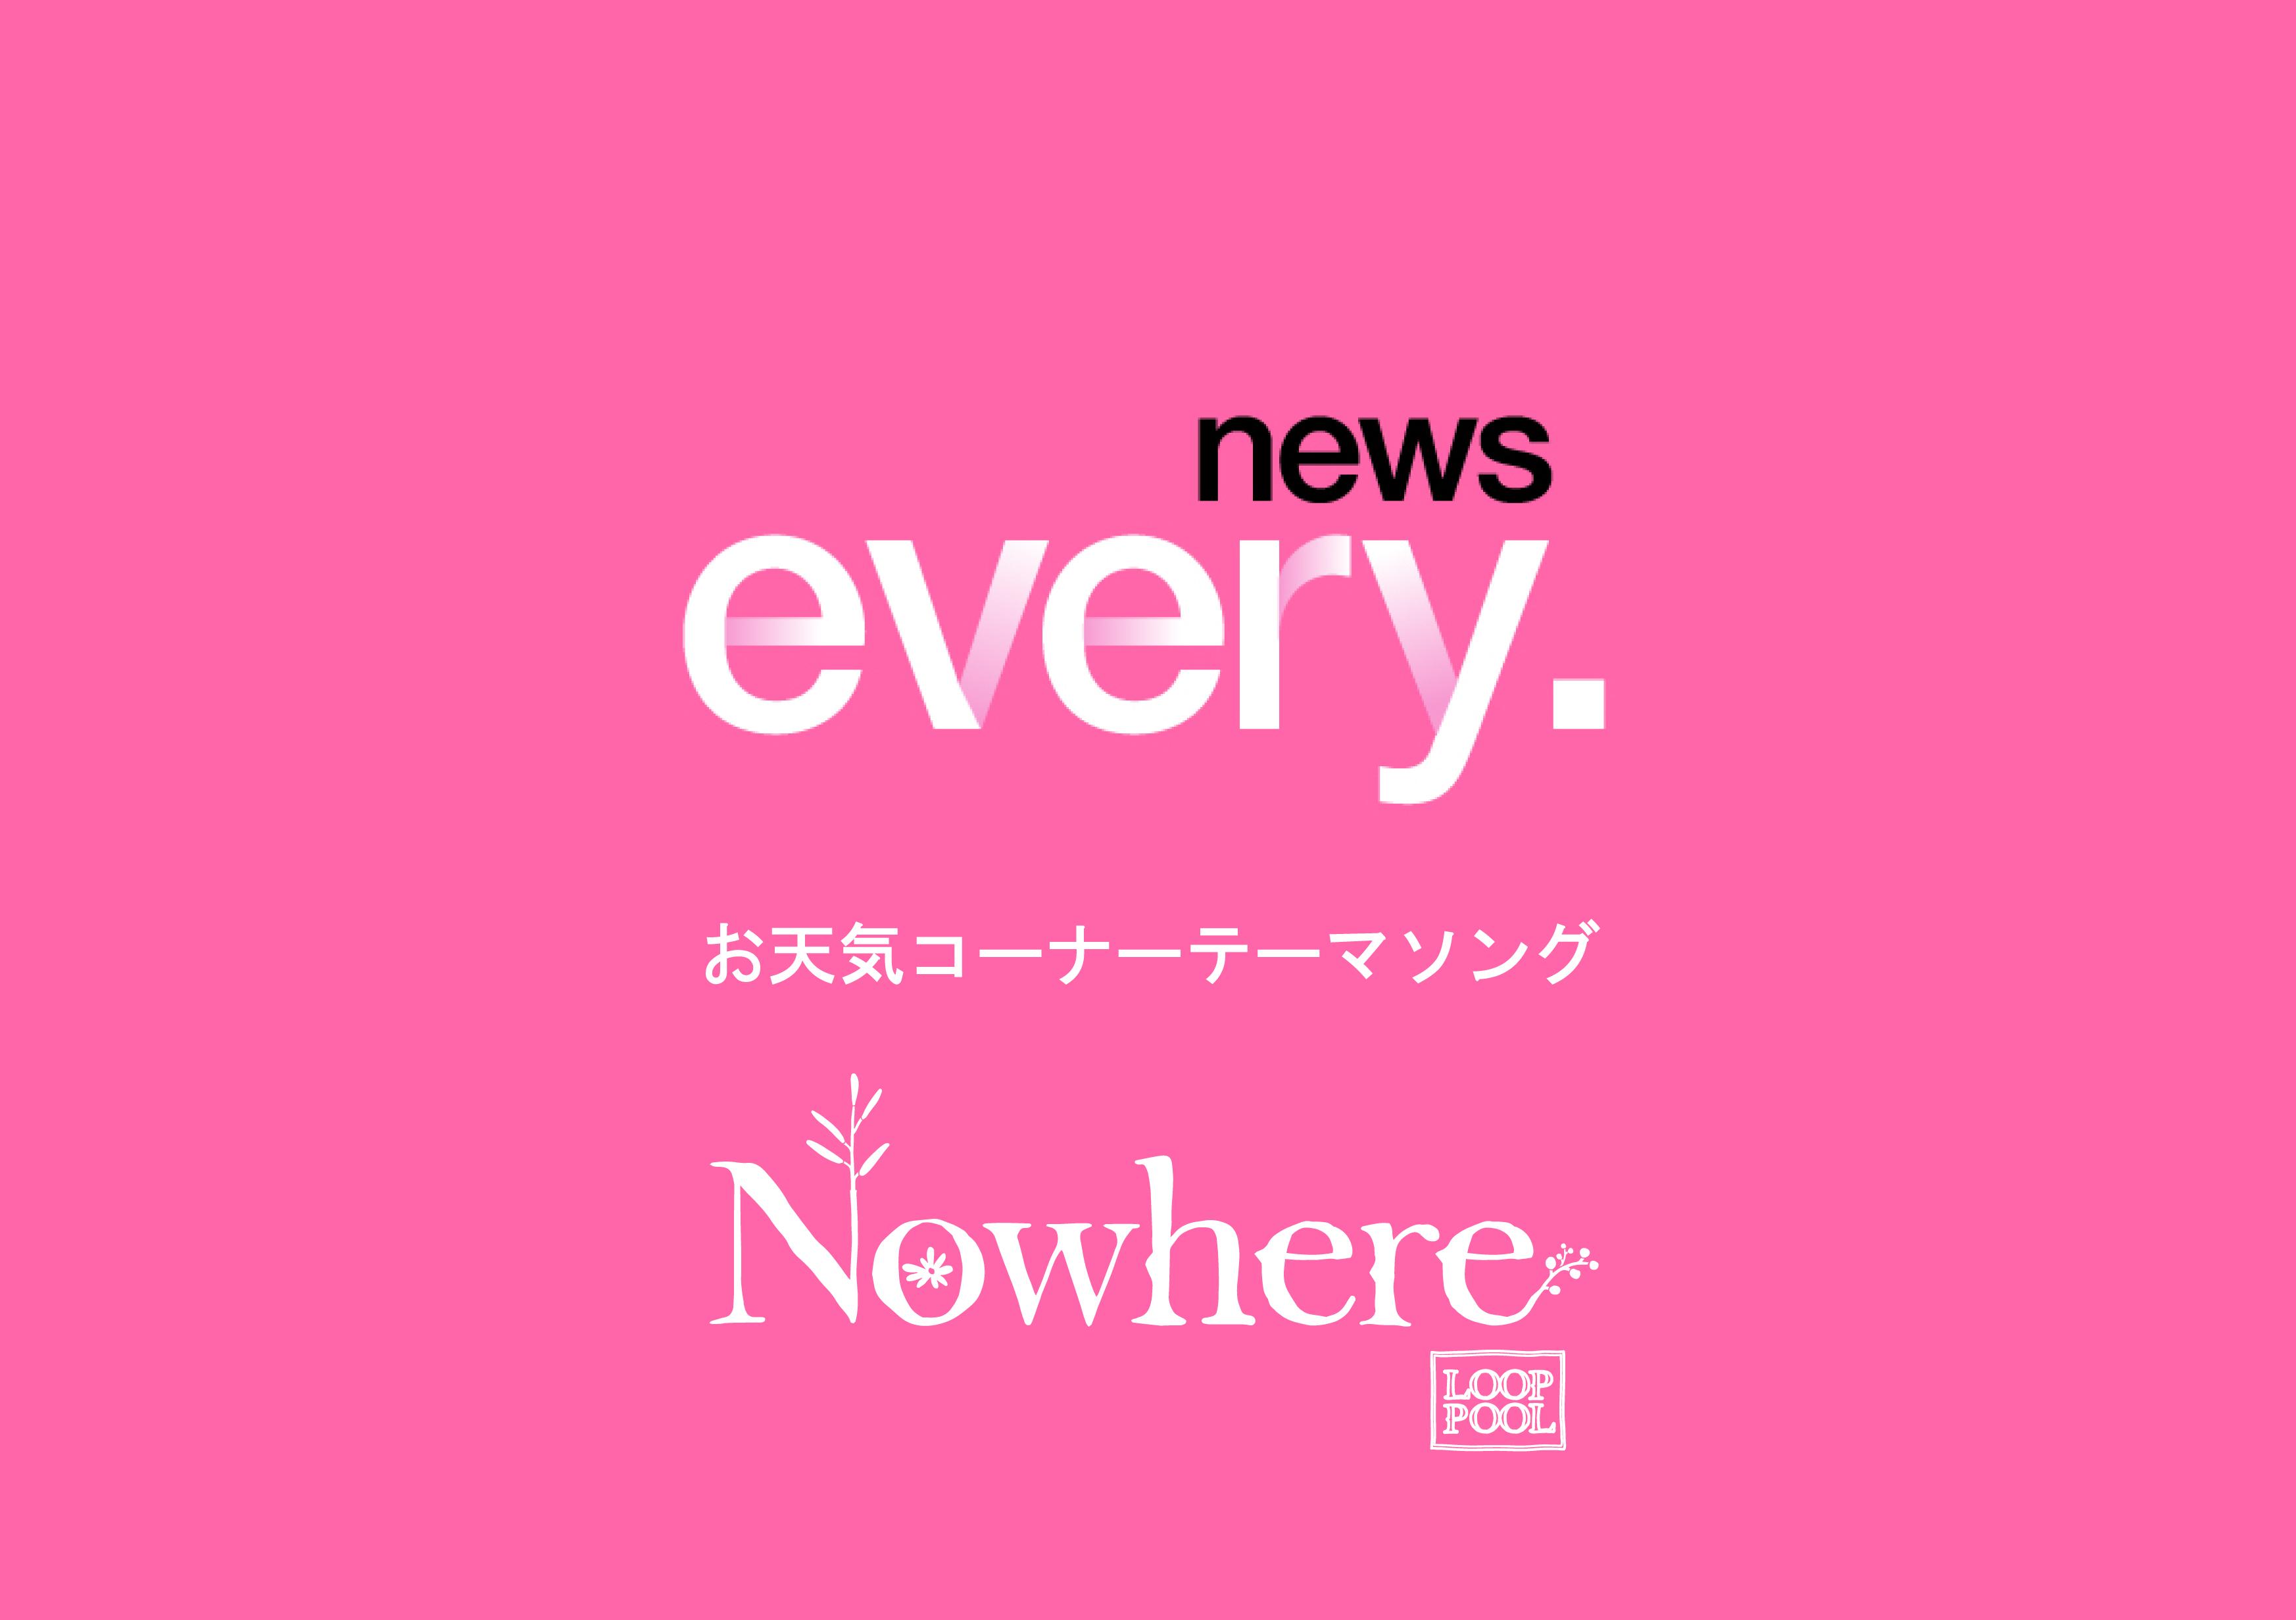 news-every